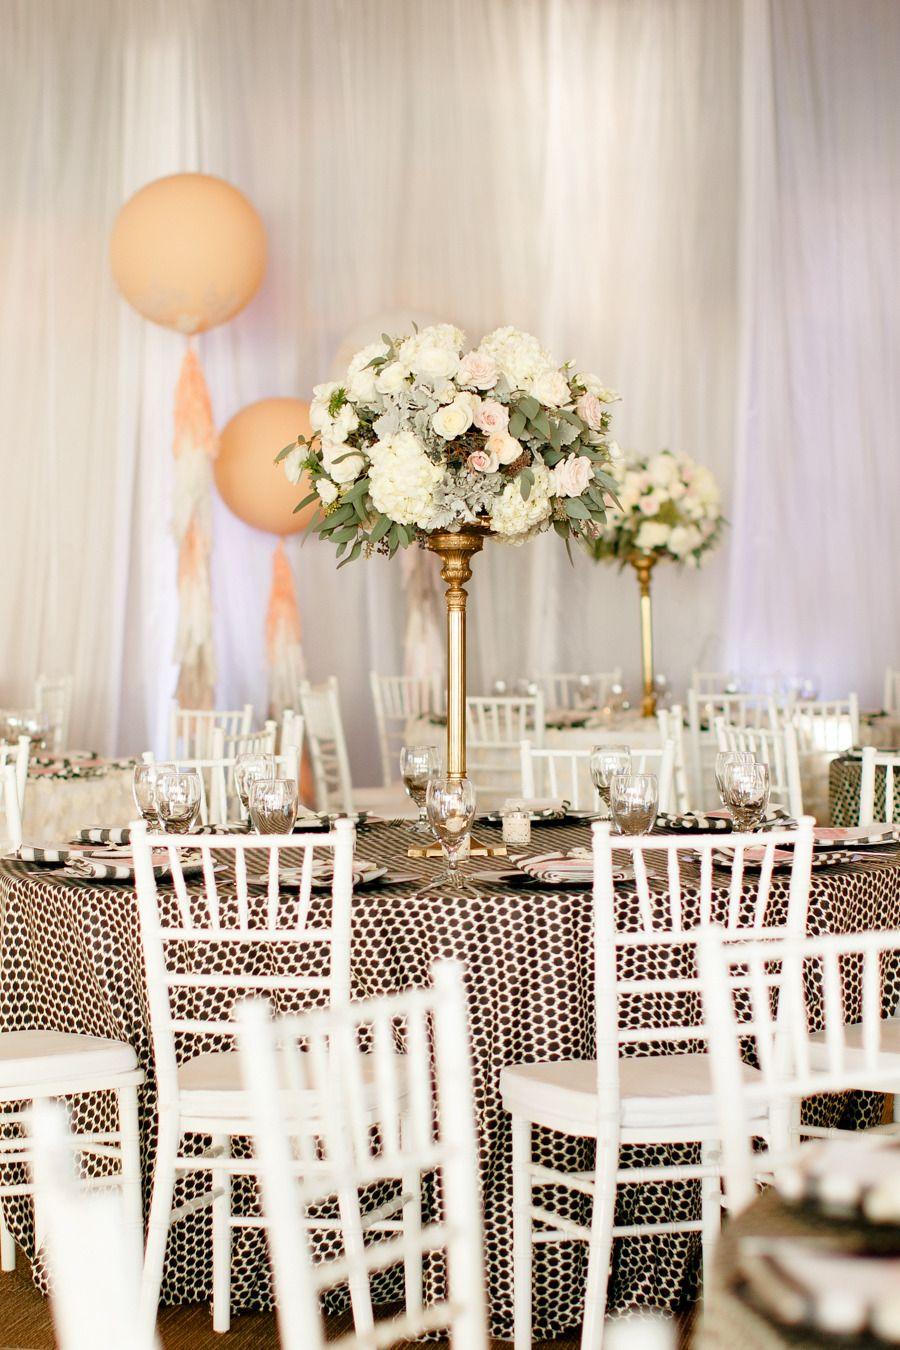 Black, White + Blush Seaside Wedding | Pinterest | Seaside wedding ...